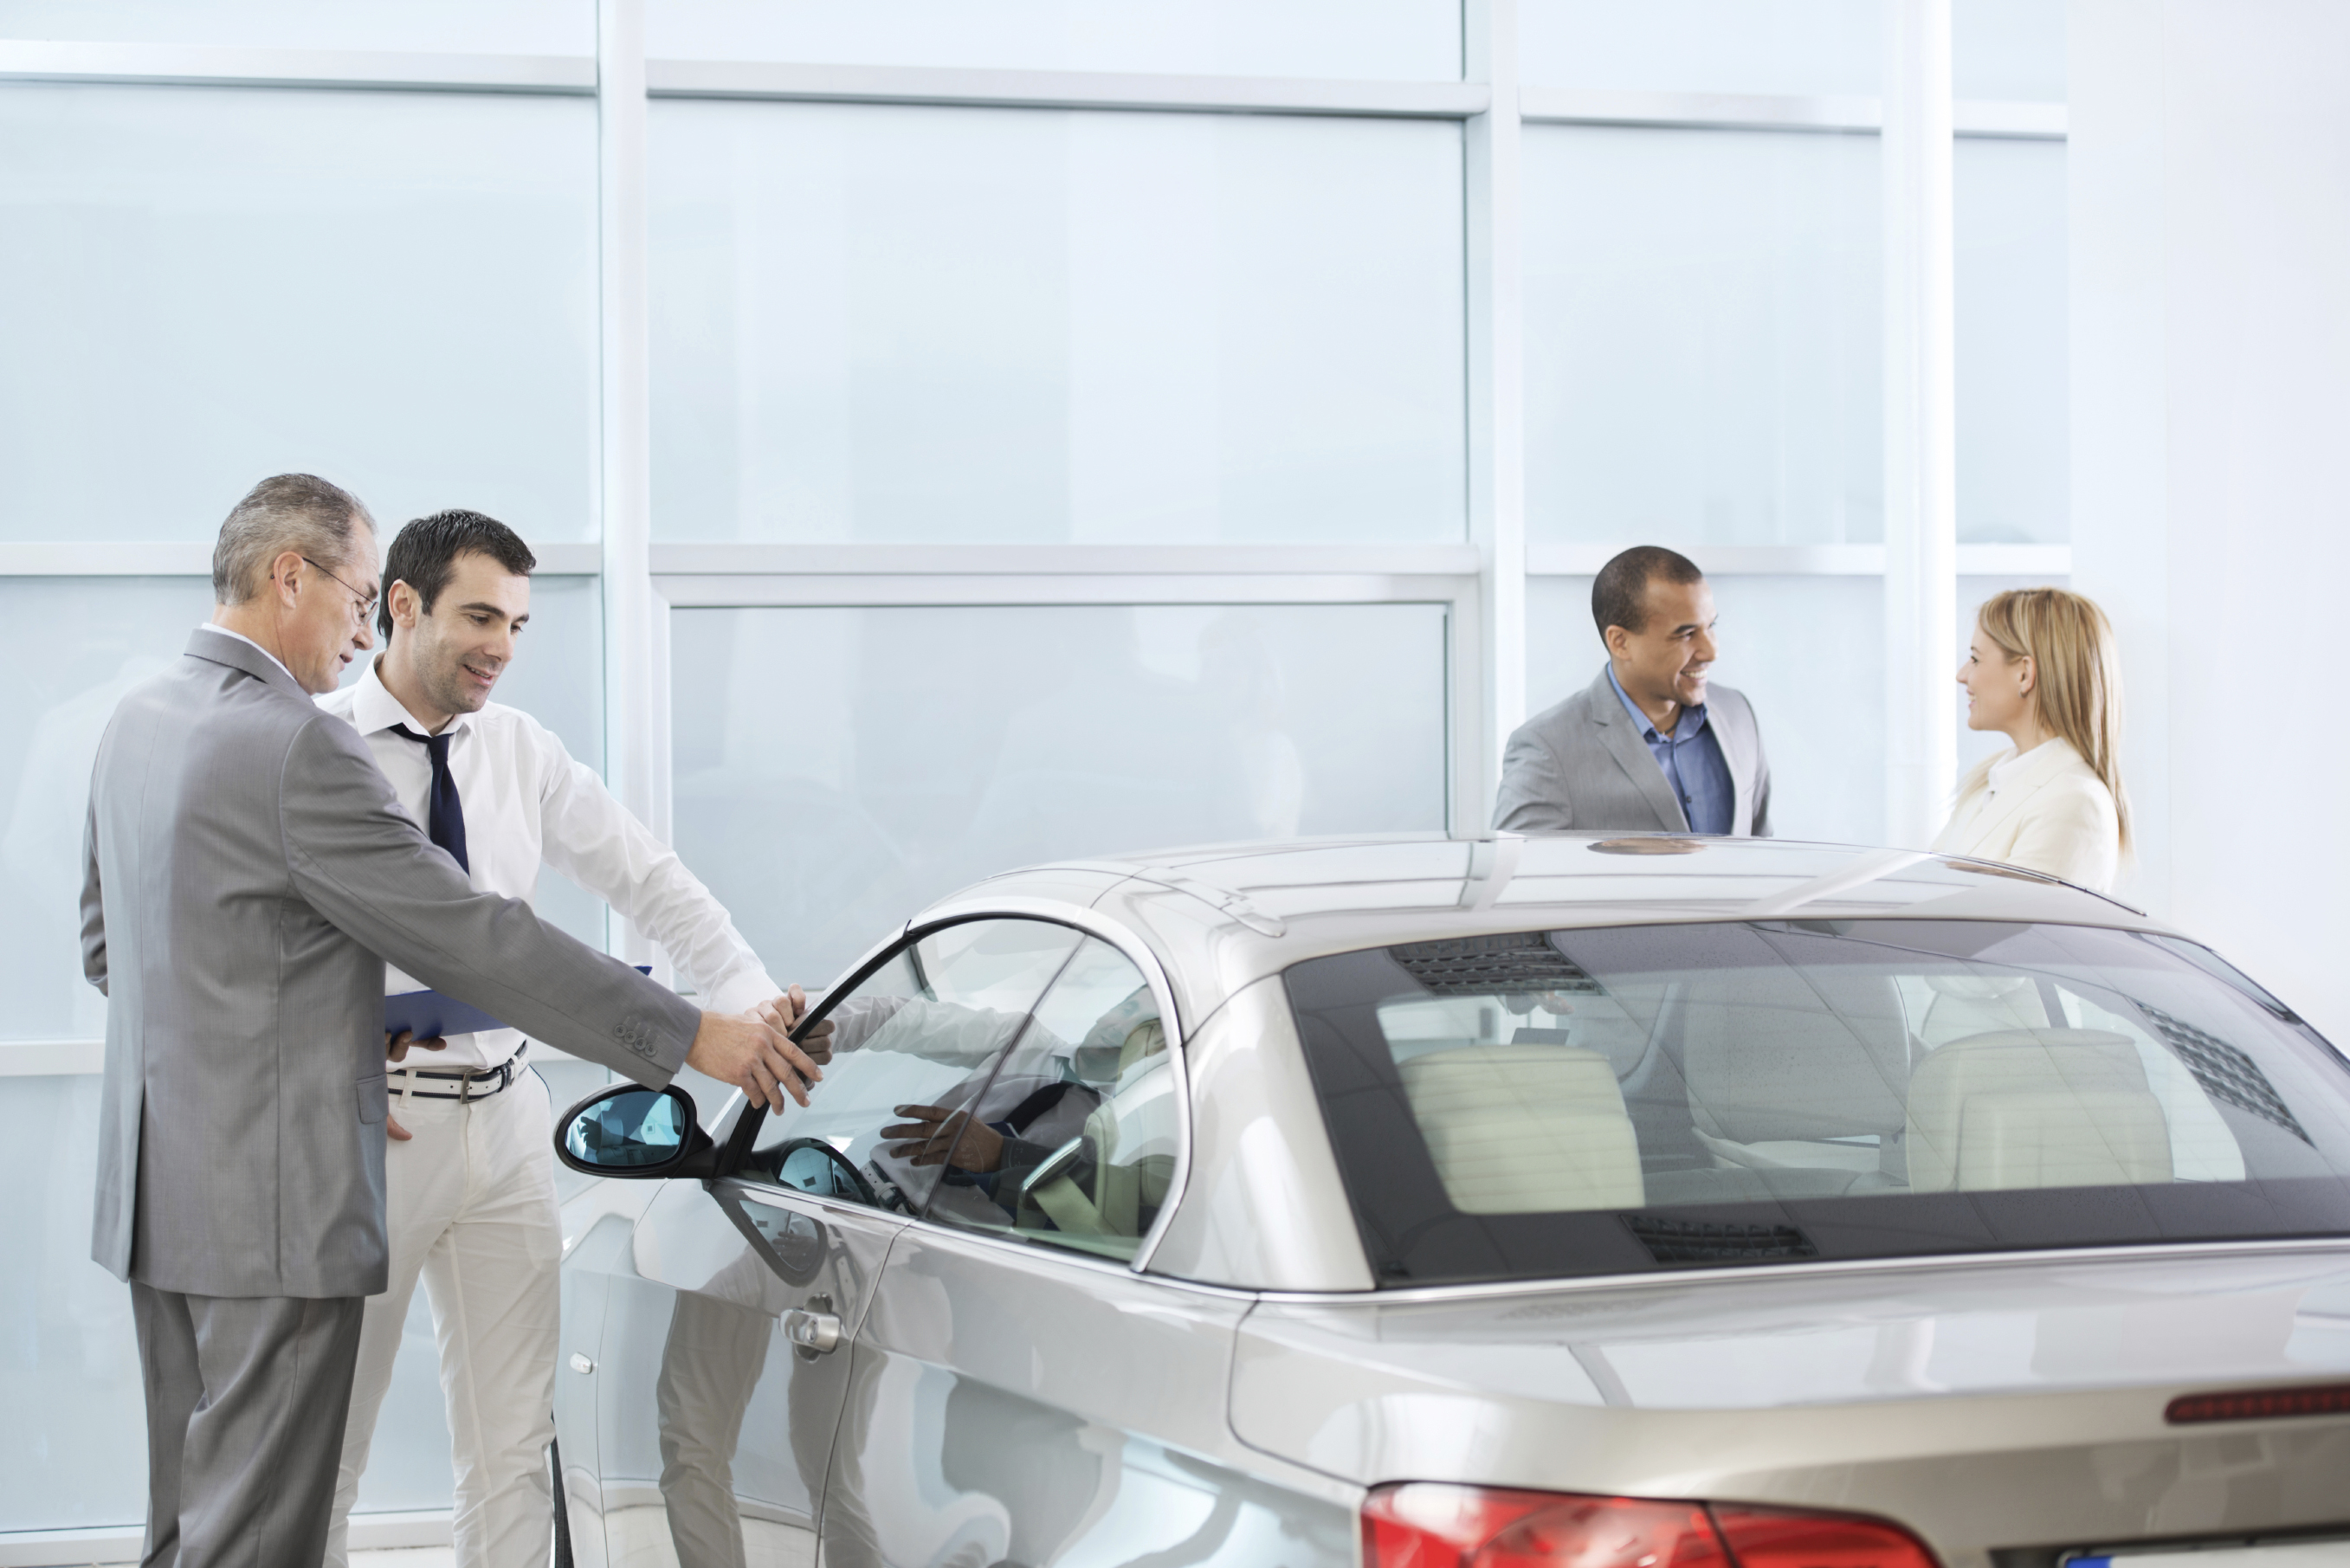 Lexus L/Certified Pre-Owned Vehicles for Sale near Reston, VA